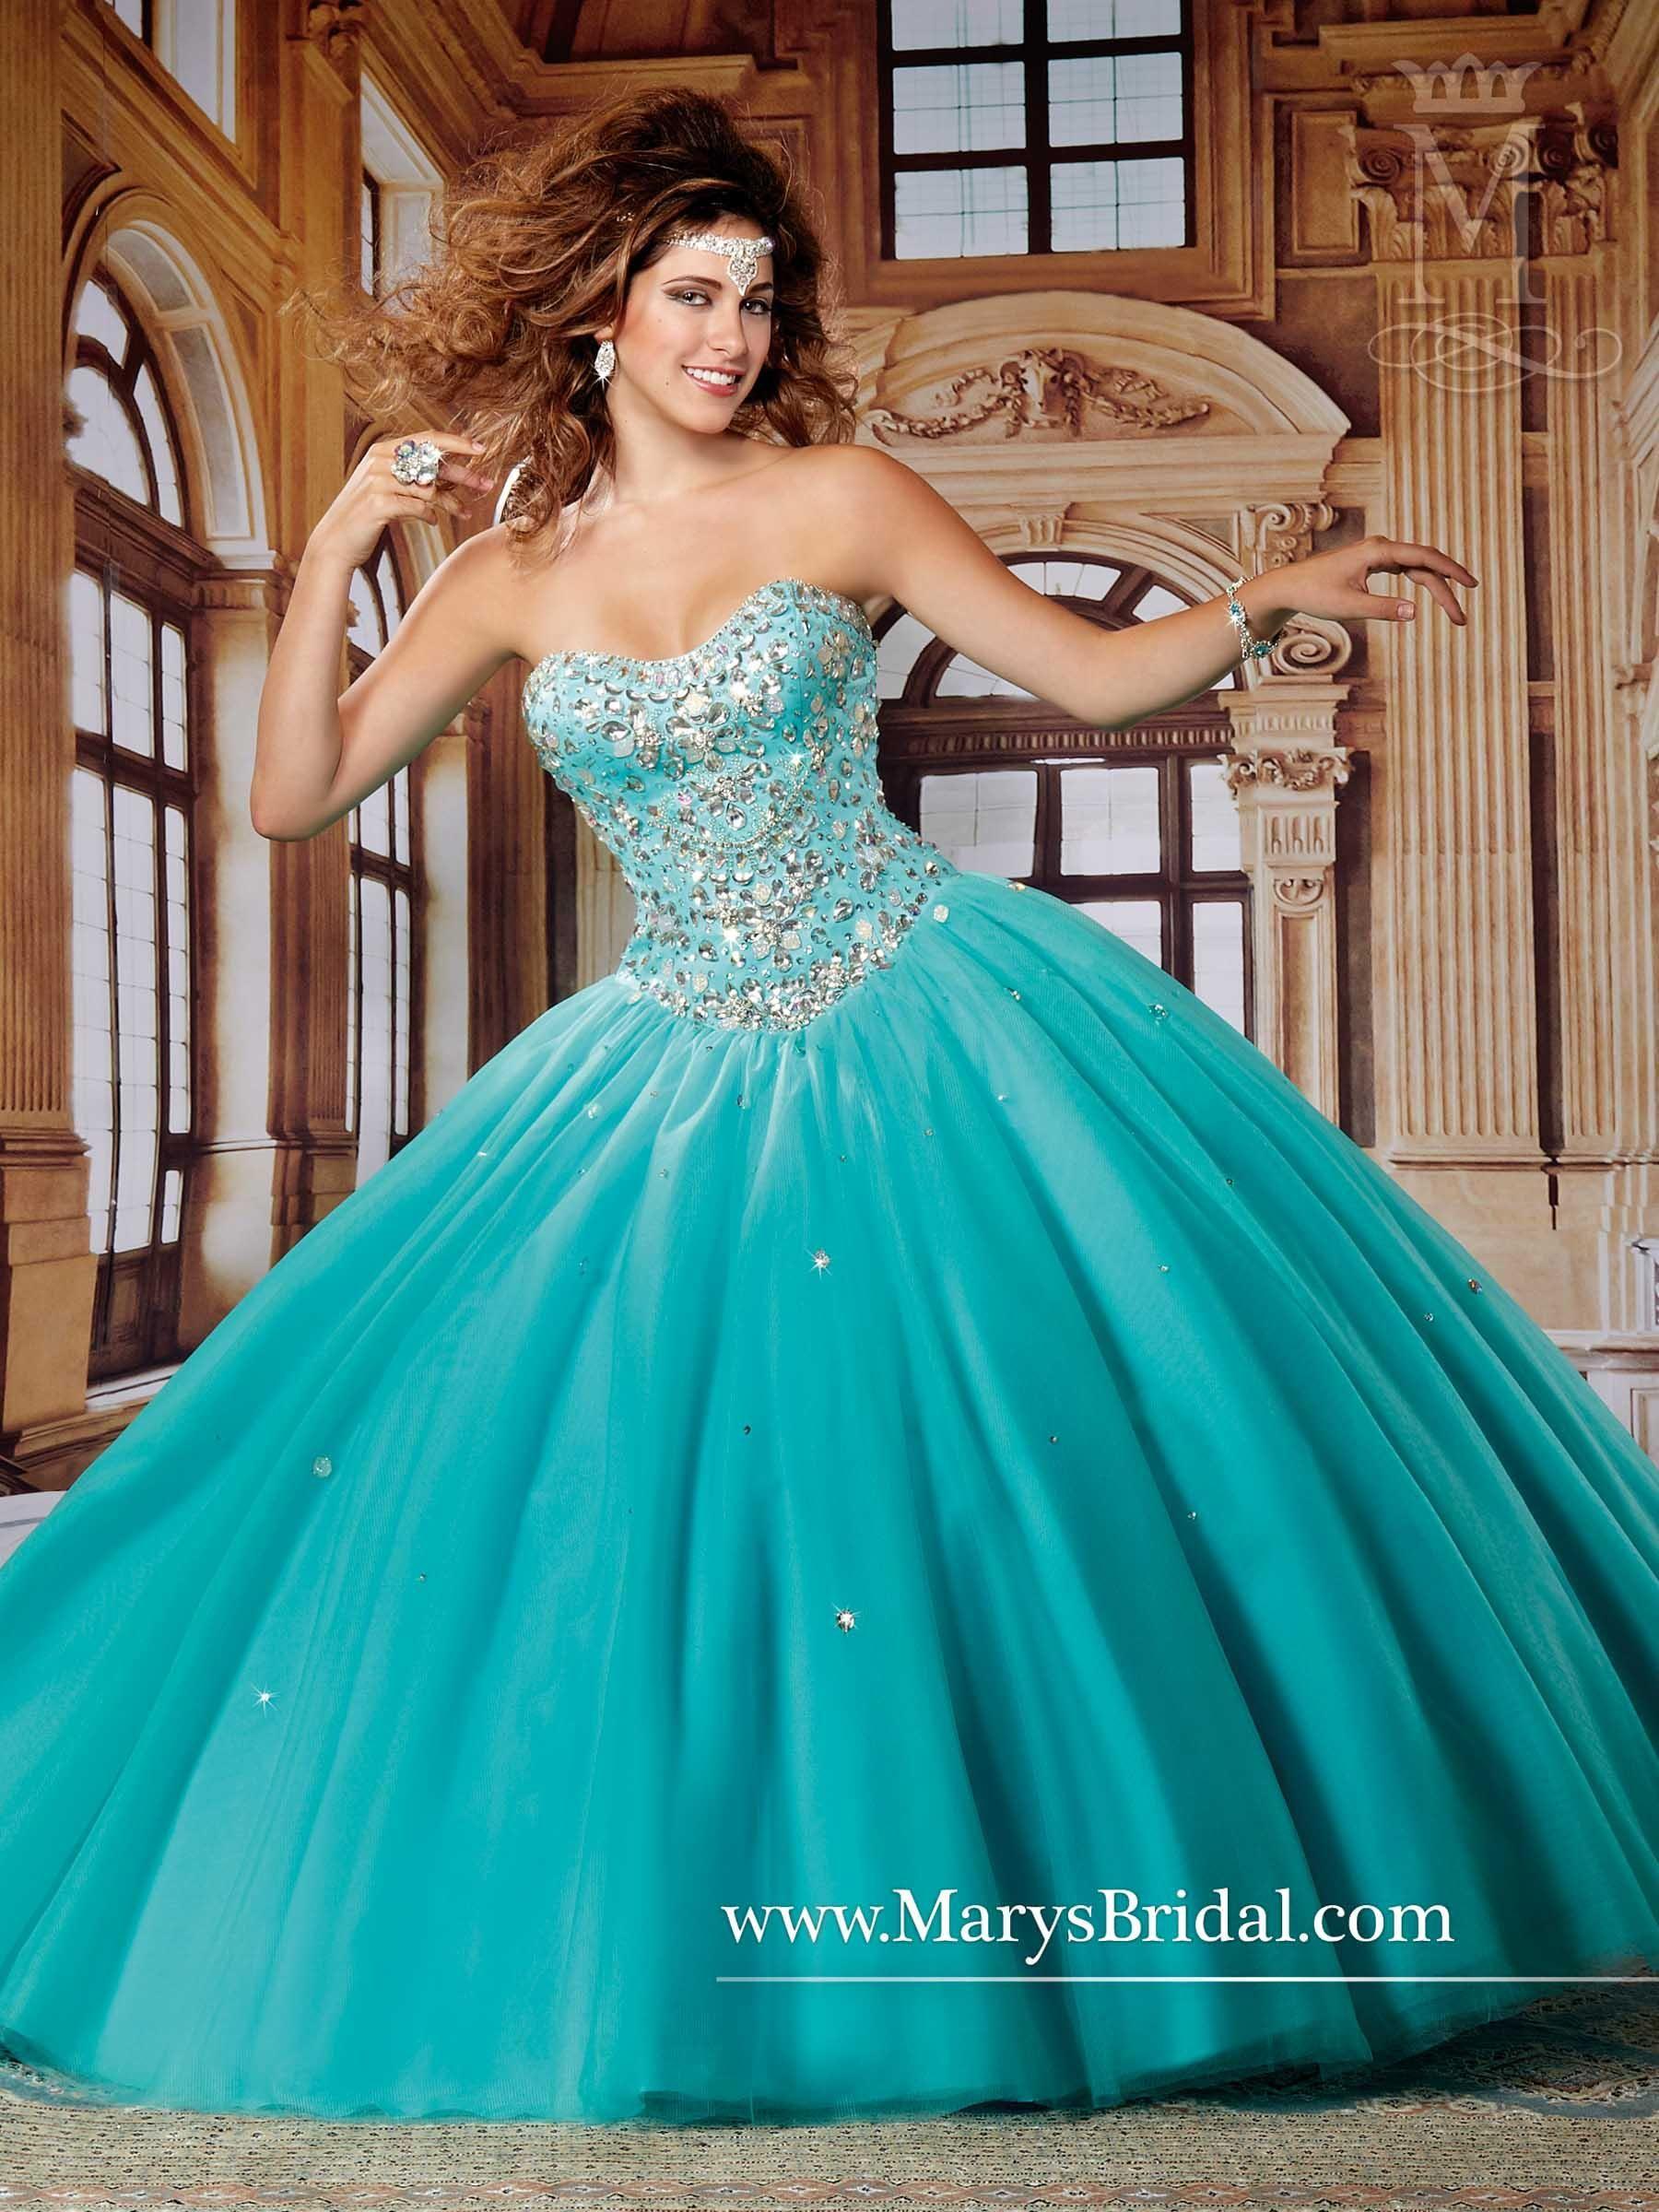 Mary' Aqua Quinceanera Dresses 2015 Fall Sweetheart Neck